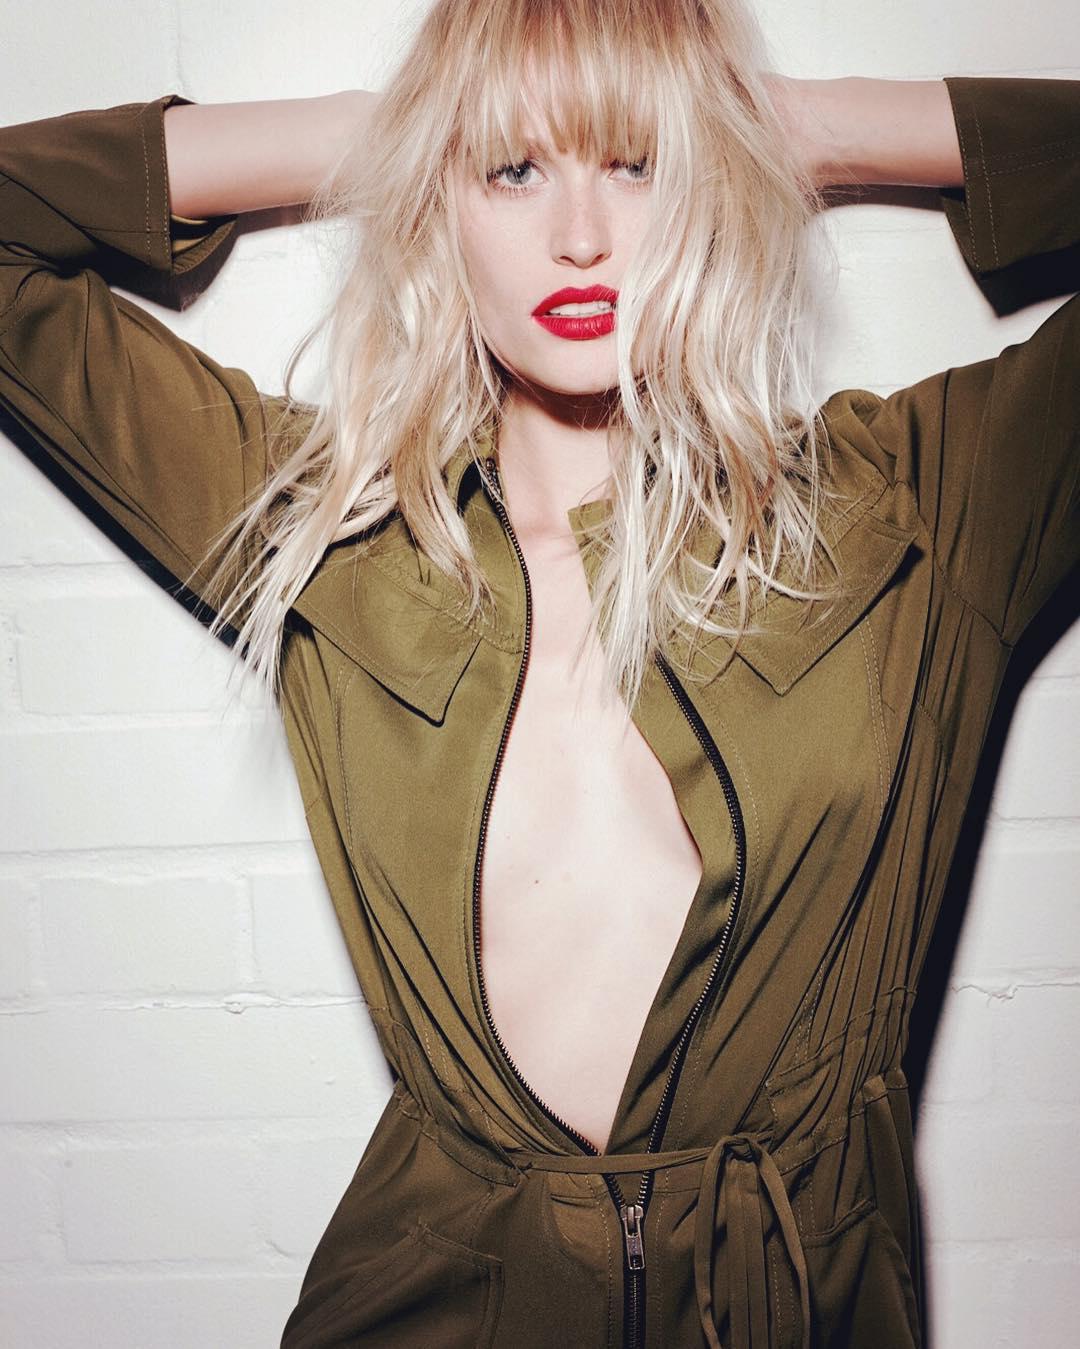 Hot Getriin Kivi nude photos 2019